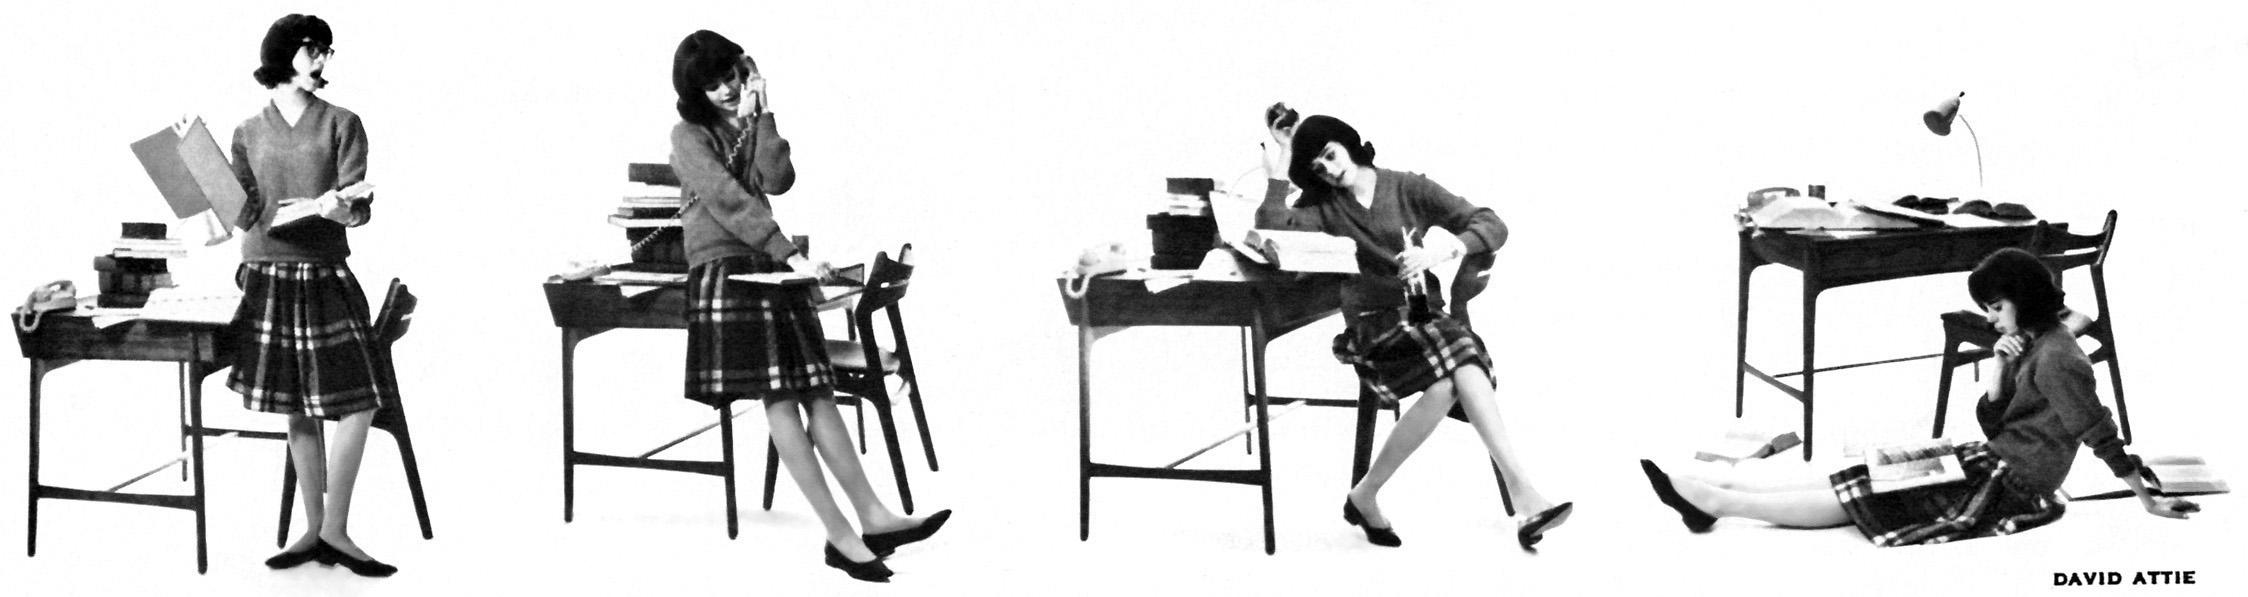 SEVENTEEN August 1962 Fashion Magazine GIANT FASHION and HAIRDO ISSUE